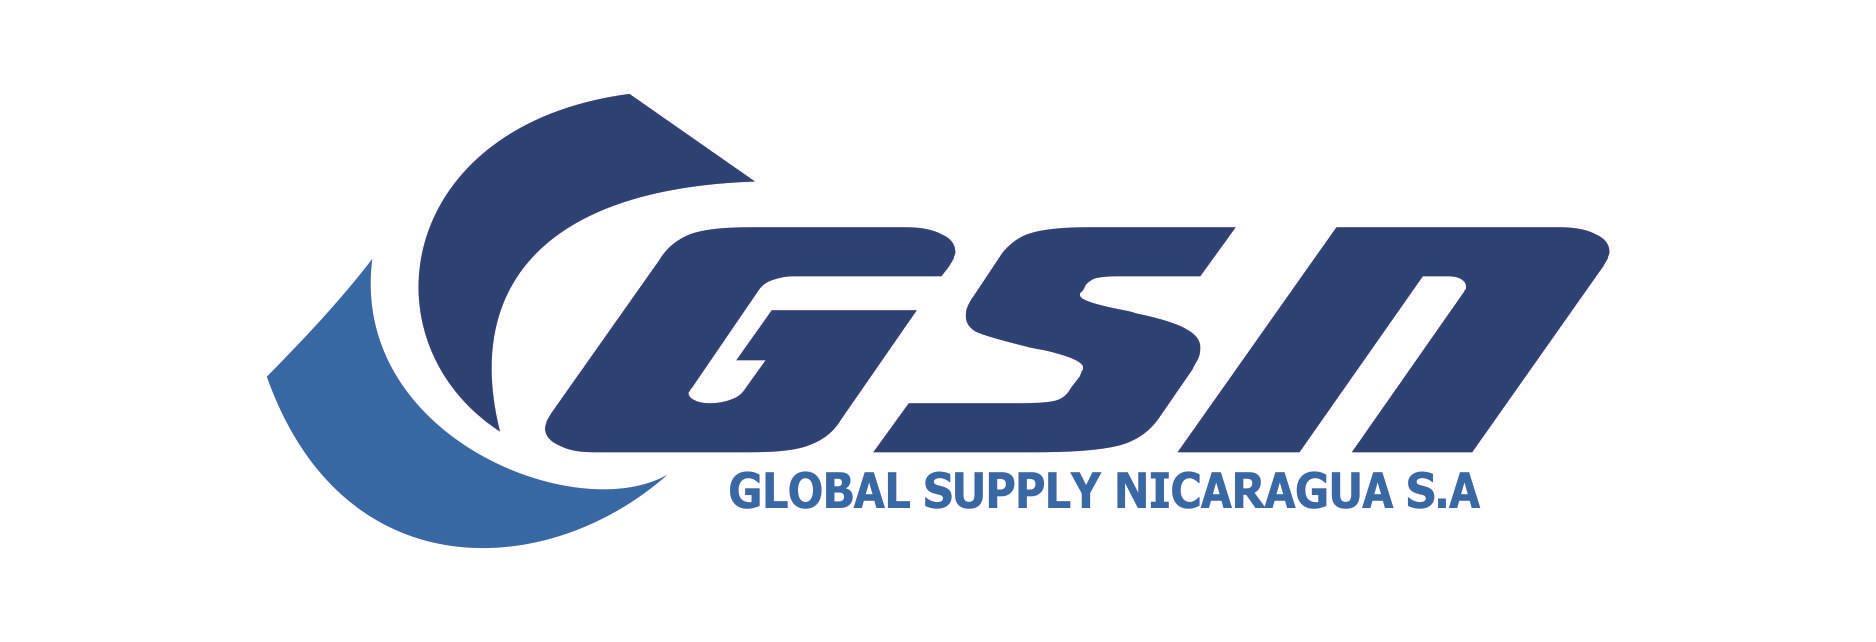 Global Supply de Nicaragua S.A